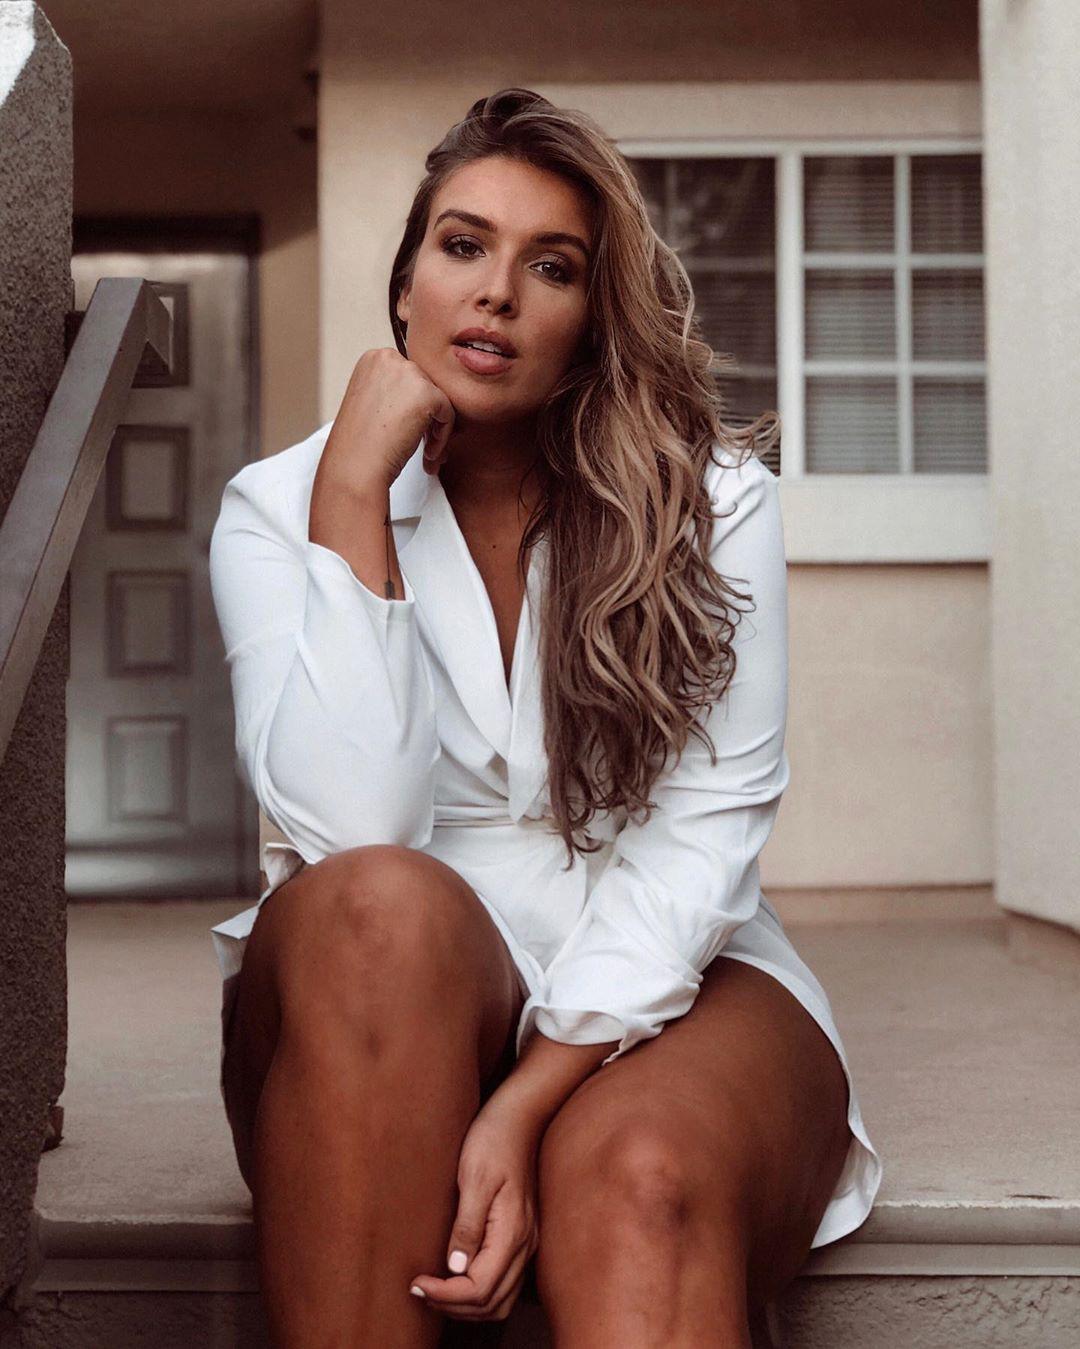 Stephanie Viada best photoshoot ideas, hot thighs, sexy leg picture